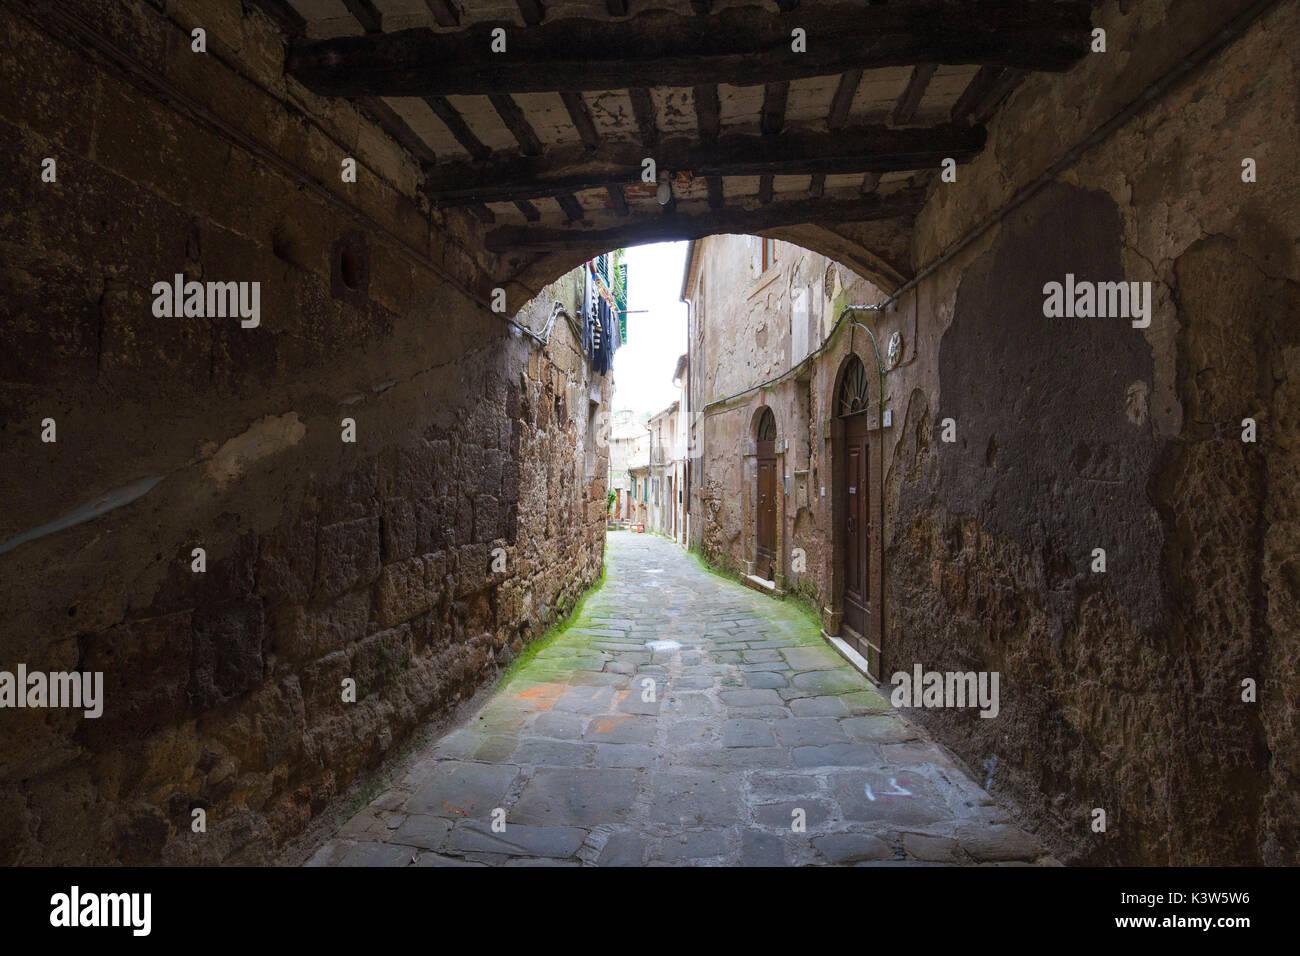 Street of the historical center of Sorano. Sorano, Grosseto province, Tuscany, Italy, Europe - Stock Image